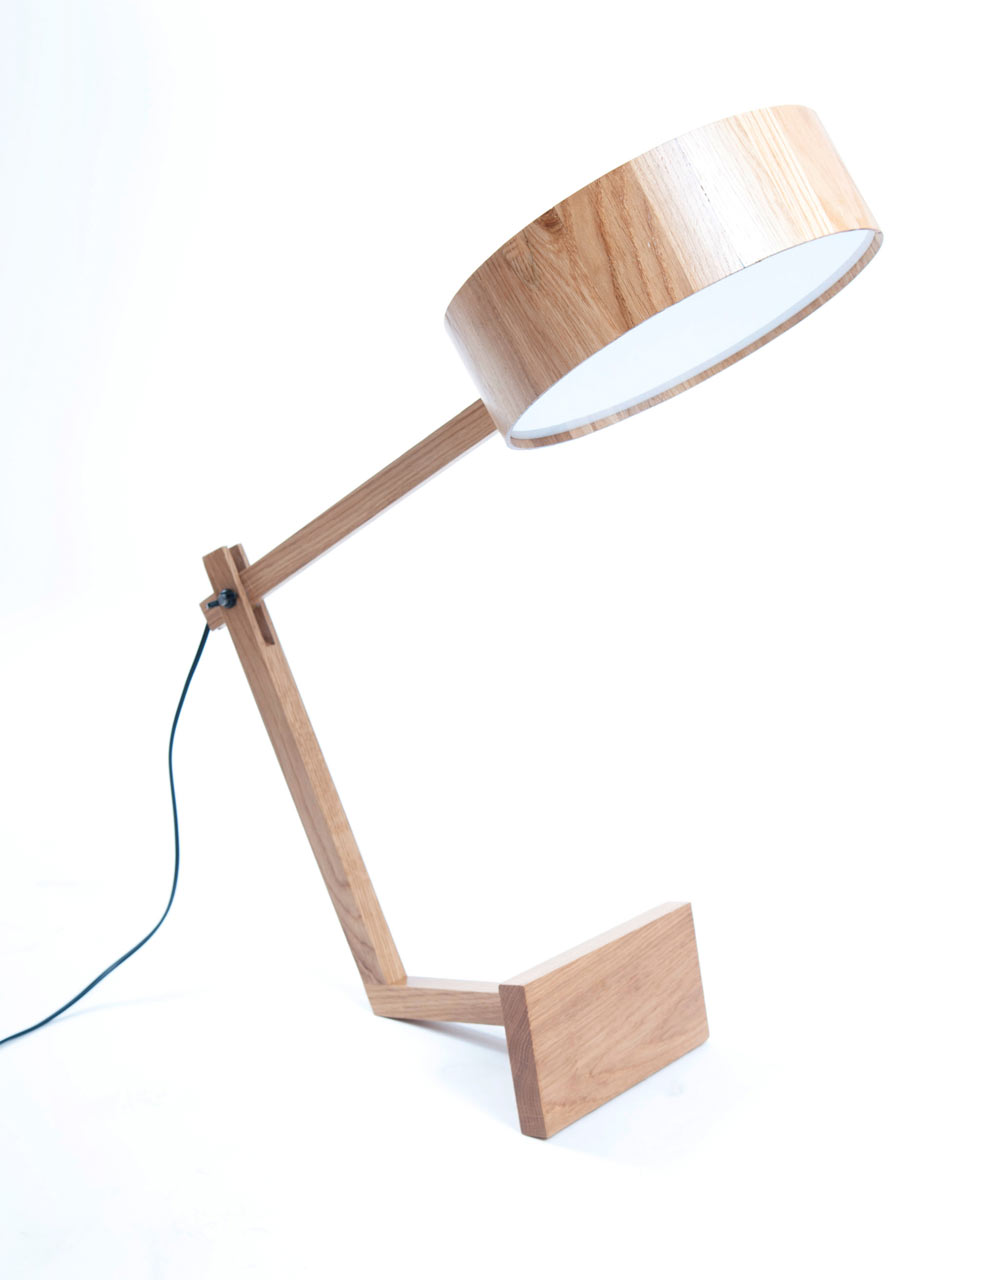 Bob-Lamp-shpelyk-roman-2a